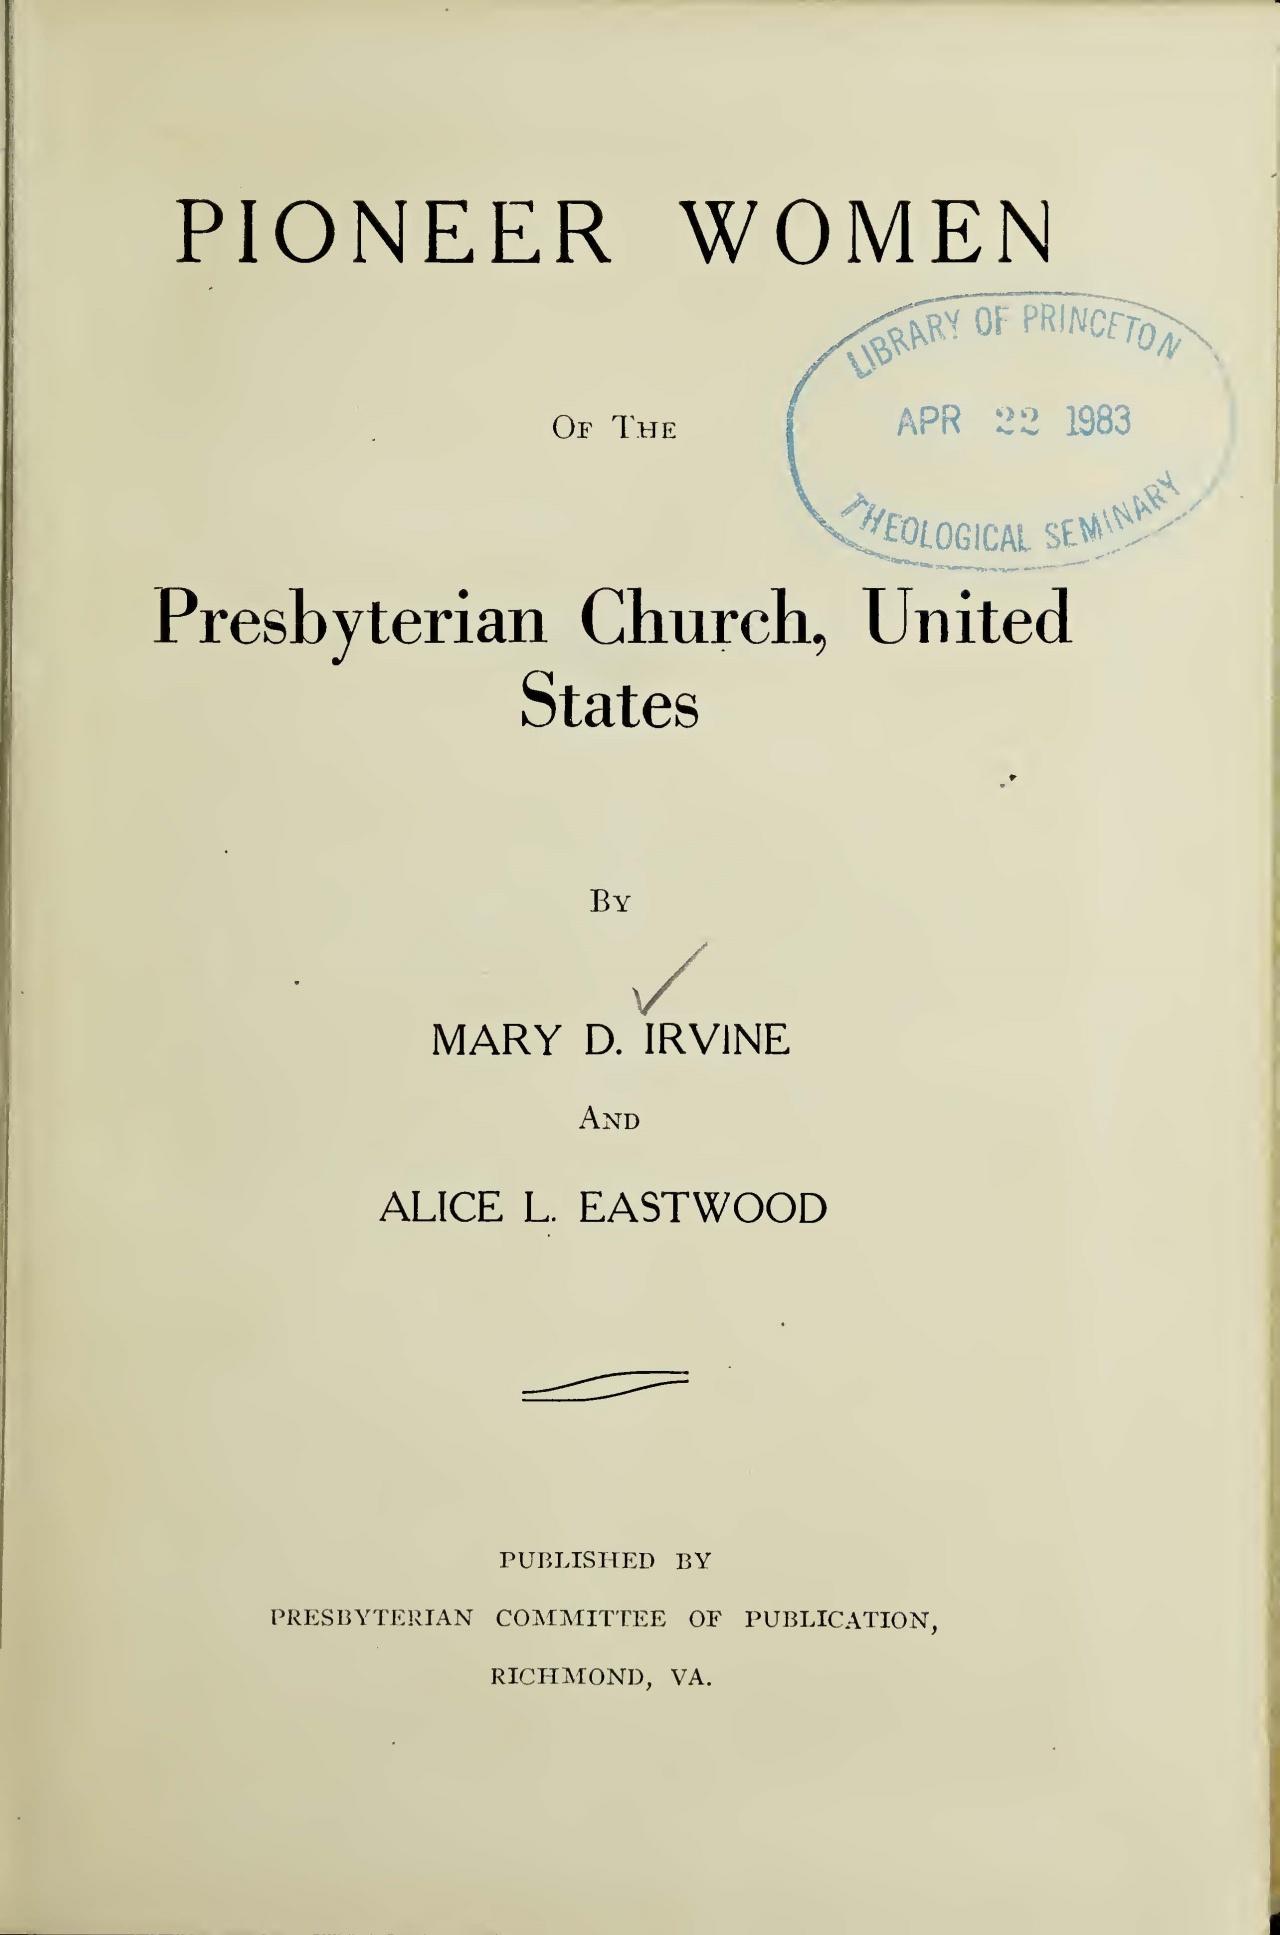 Irvine, Mary Davis, Pioneer Women of the Presbyterian Church, U.S. Title Page.jpg